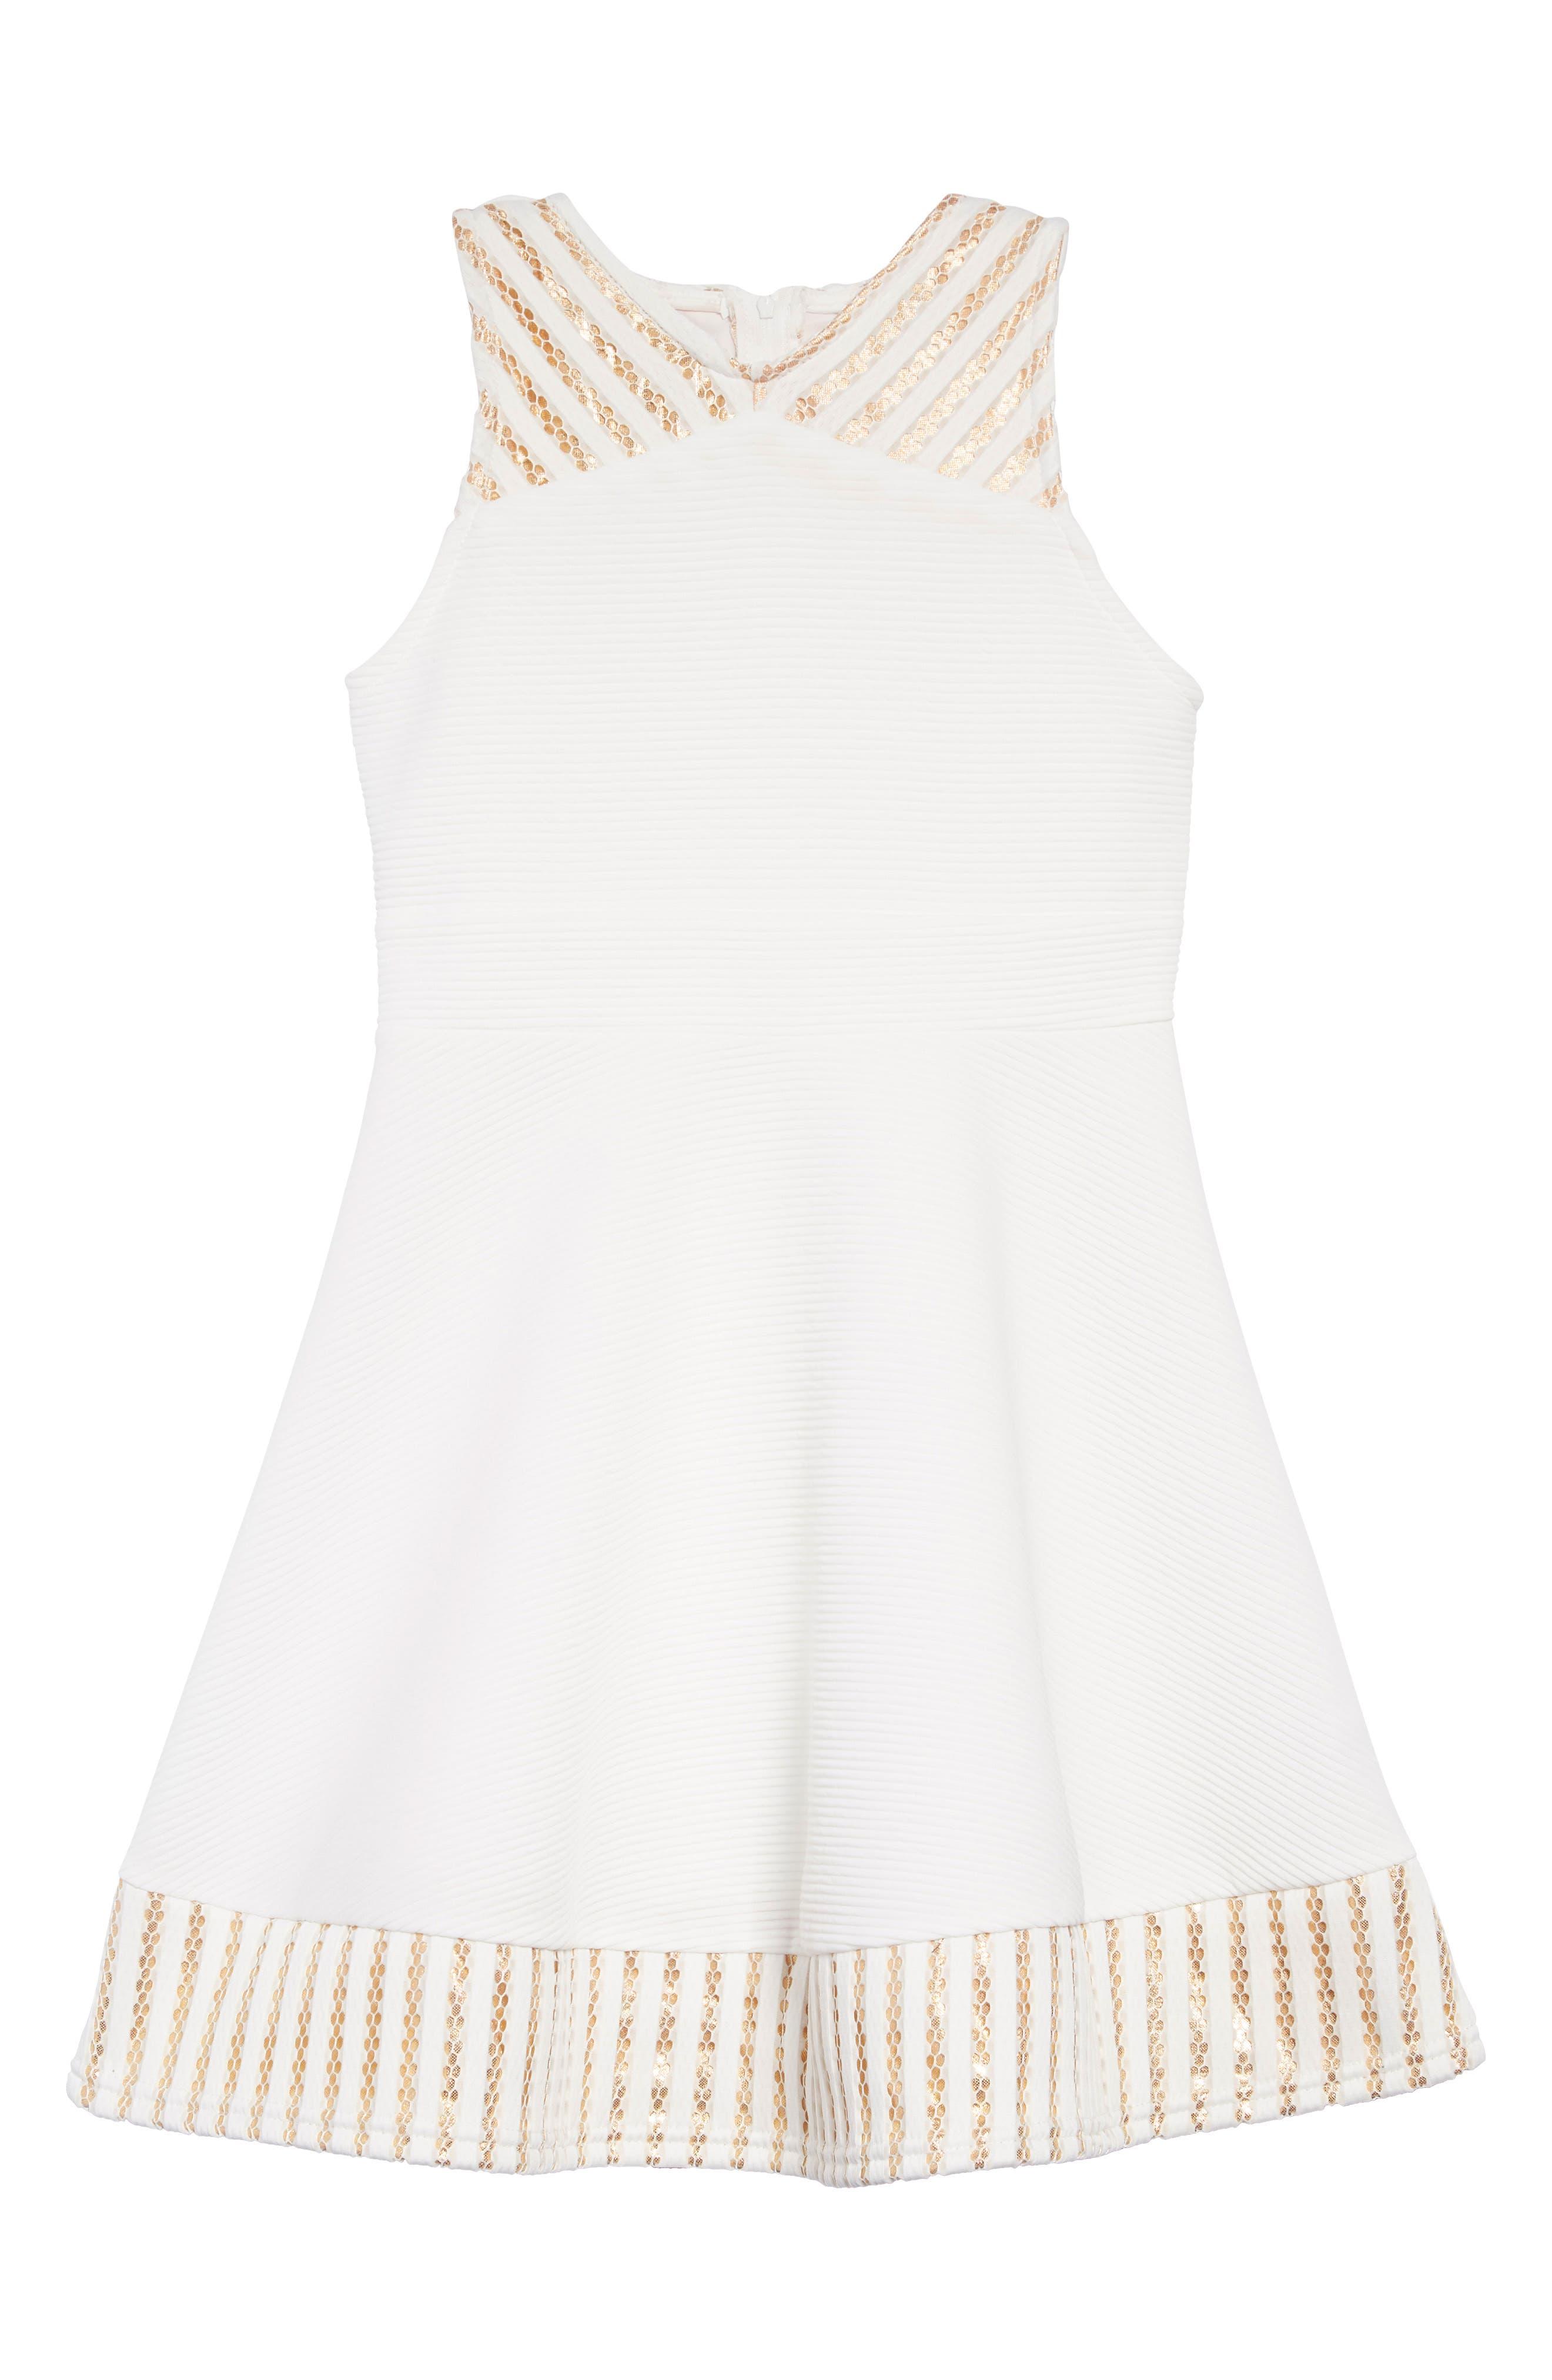 Metallic Trim Ribbed Skater Dress,                             Main thumbnail 1, color,                             WHITE/GOLD